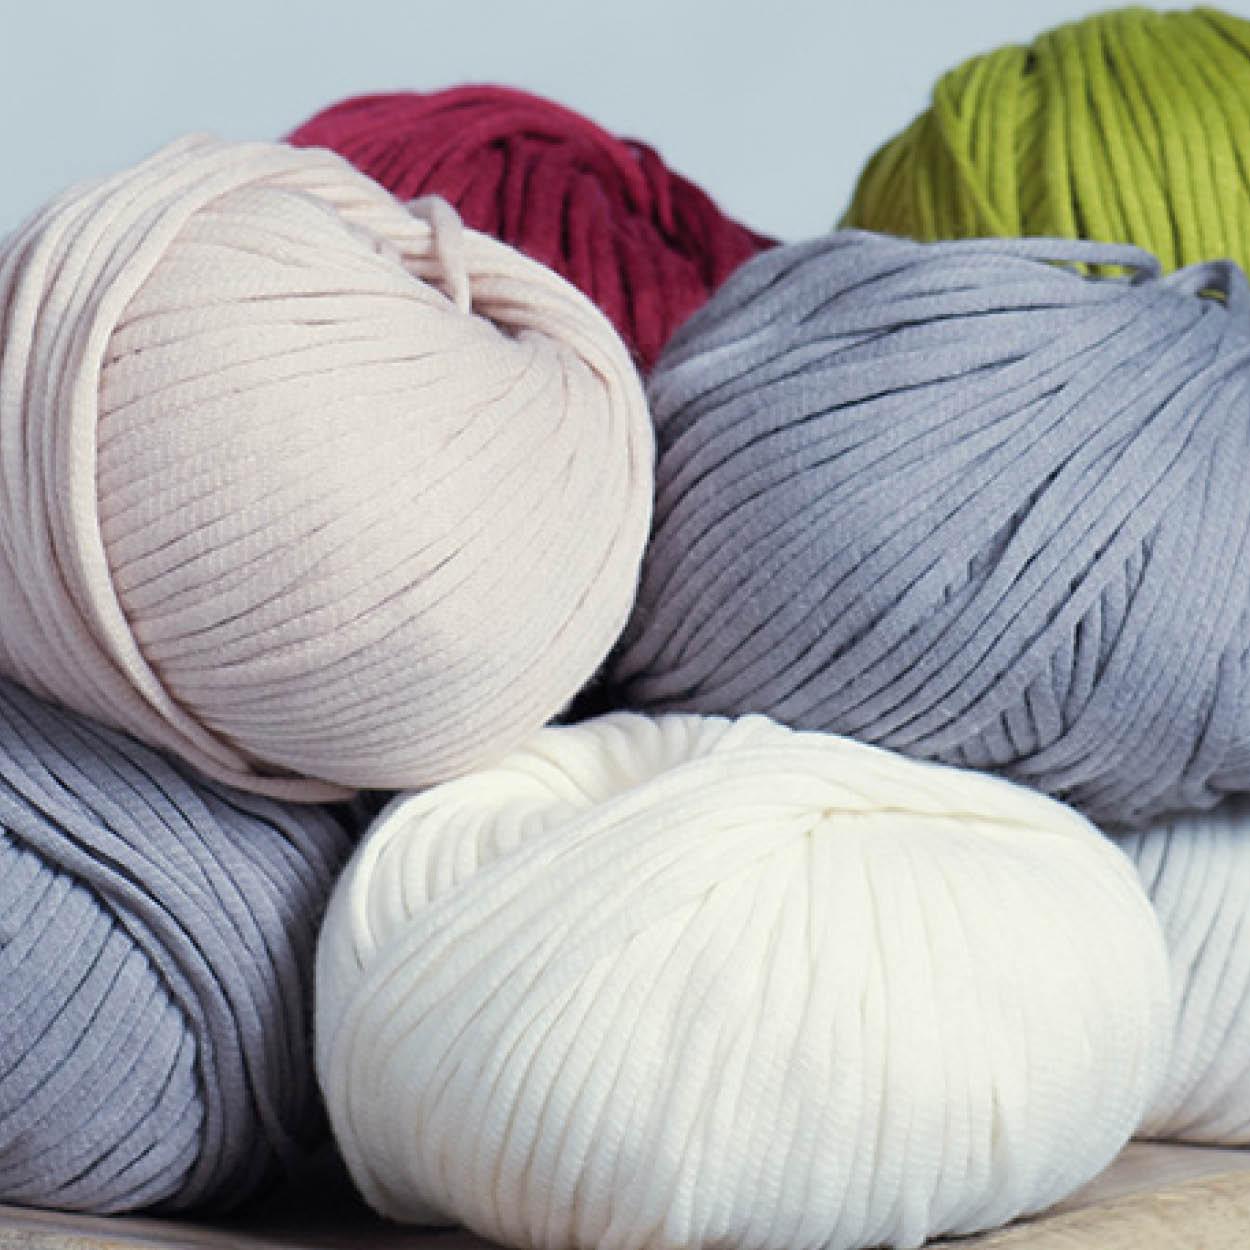 Rowan Selects Mako Cotton